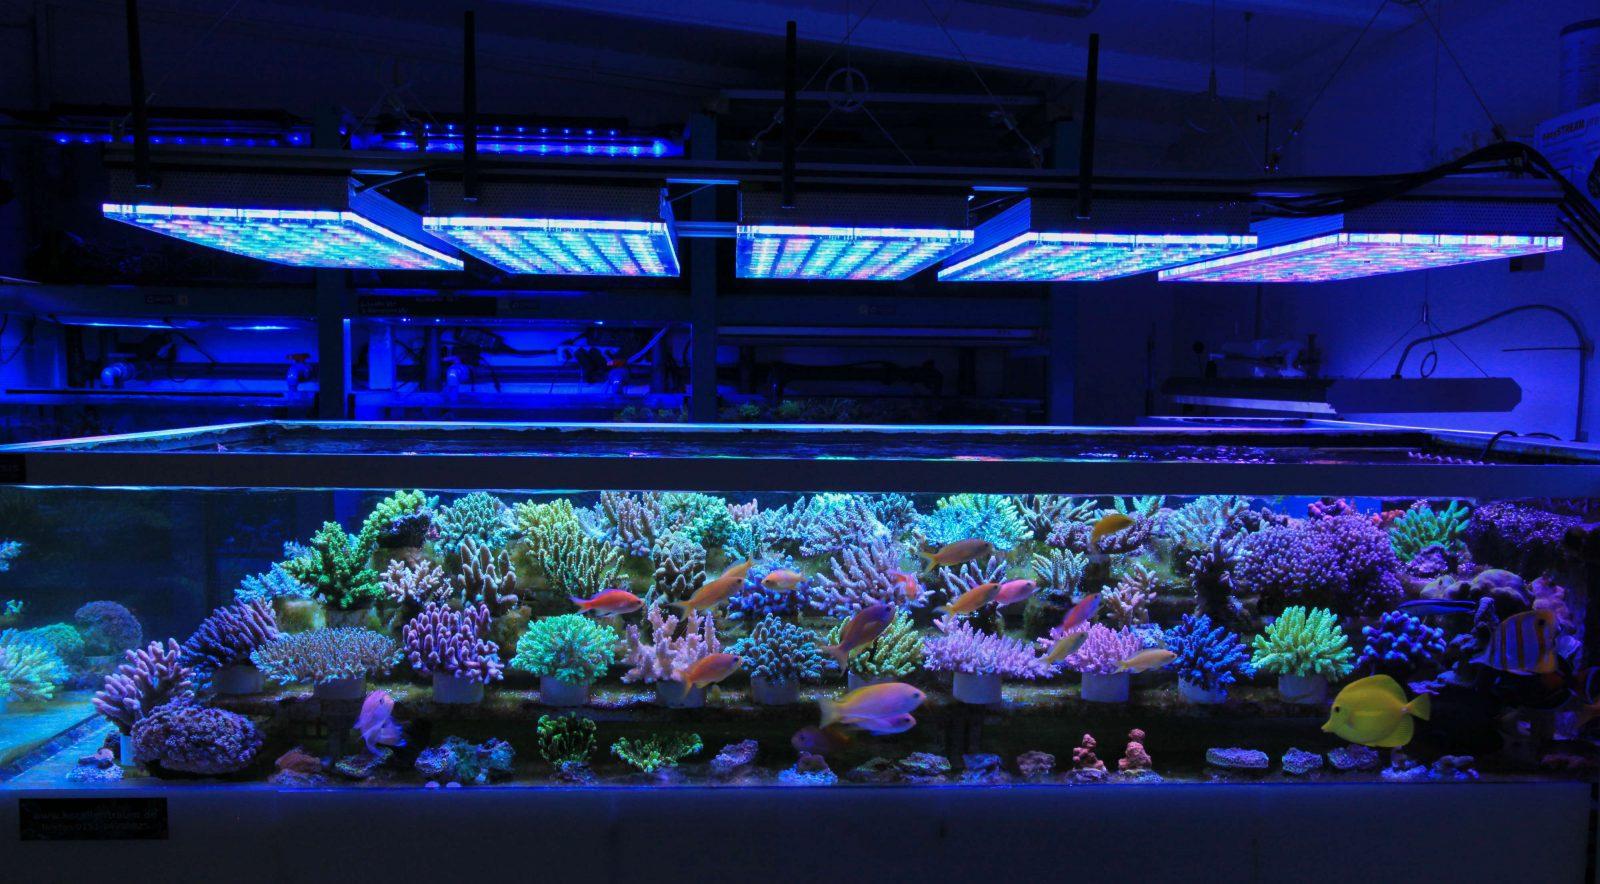 Acuario de iluminación LED arrecife Orphek Atlantik v4